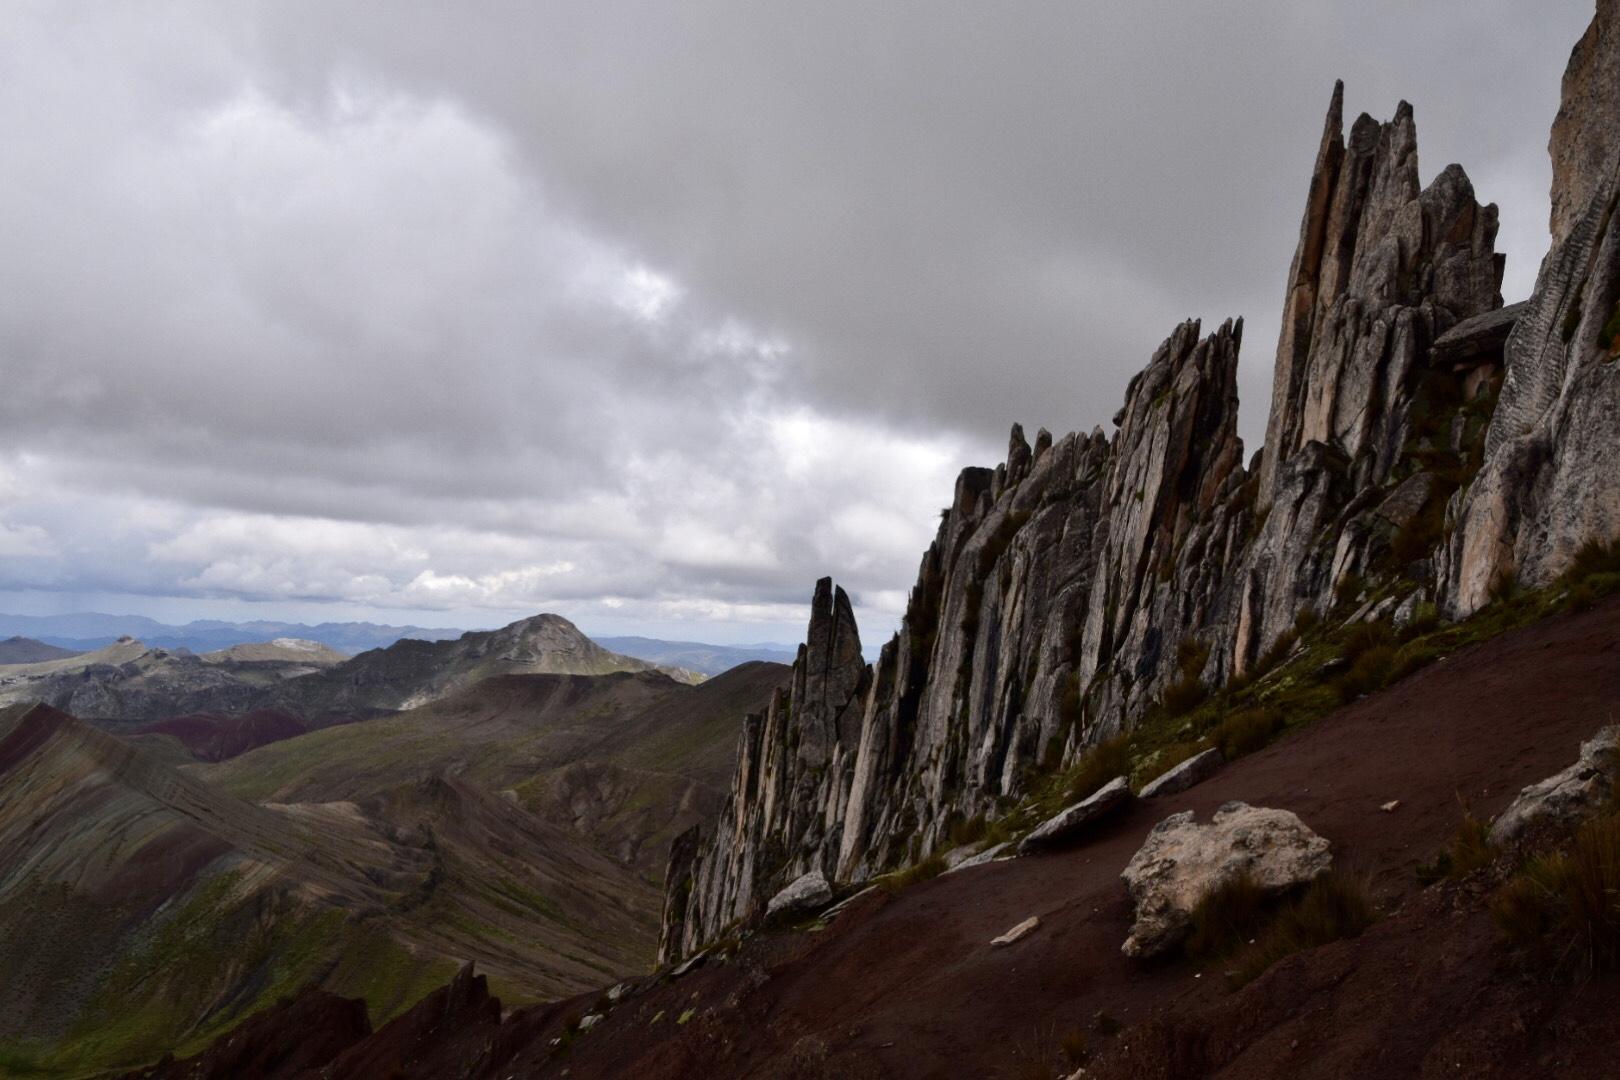 reisebericht-erlebnisreise-suedamerika-sara-rainbow-mountain-2